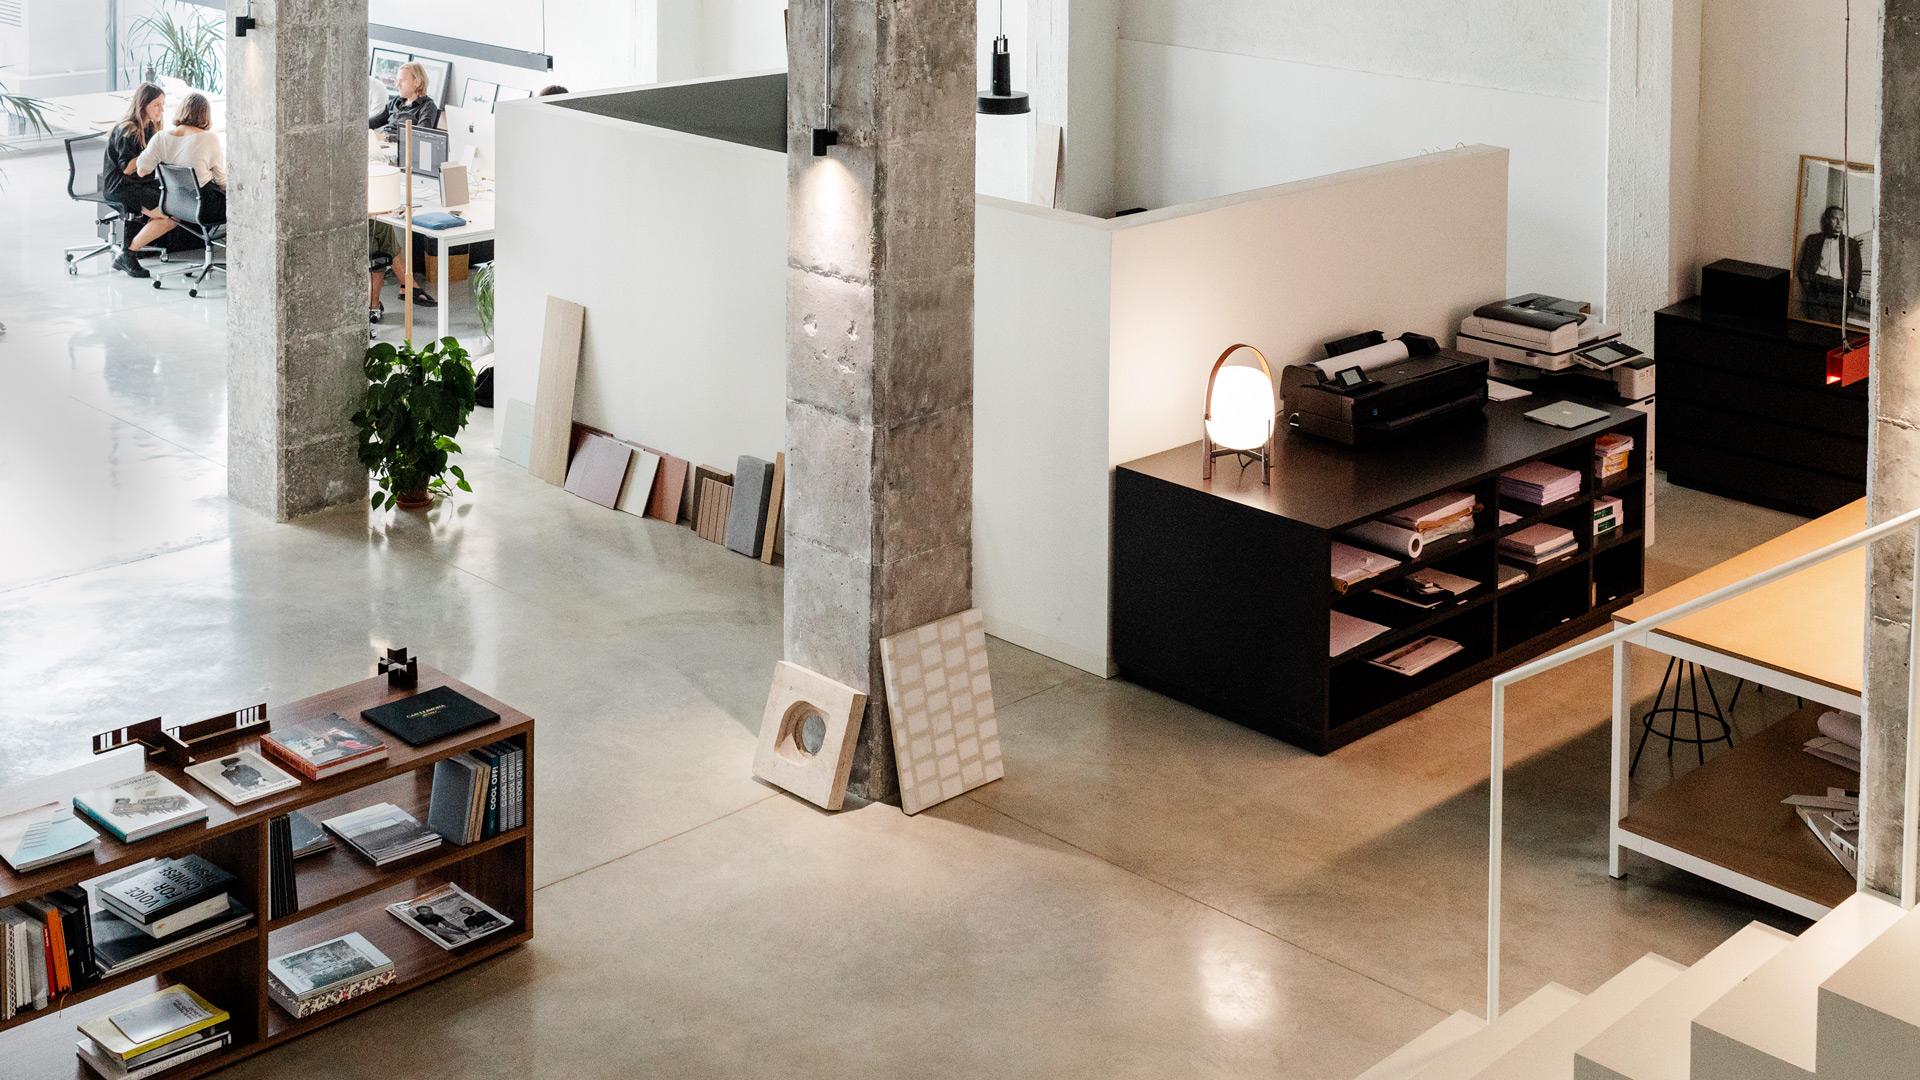 Interiorismo en Barcelona: Mesura crea proyectos lujuosos y elegantes [object object] Interiorismo en Barcelona: Mesura crea proyectos lujuosos y elegantes Gomis Mesura architecture design arquitectura dise  o Barcelona1